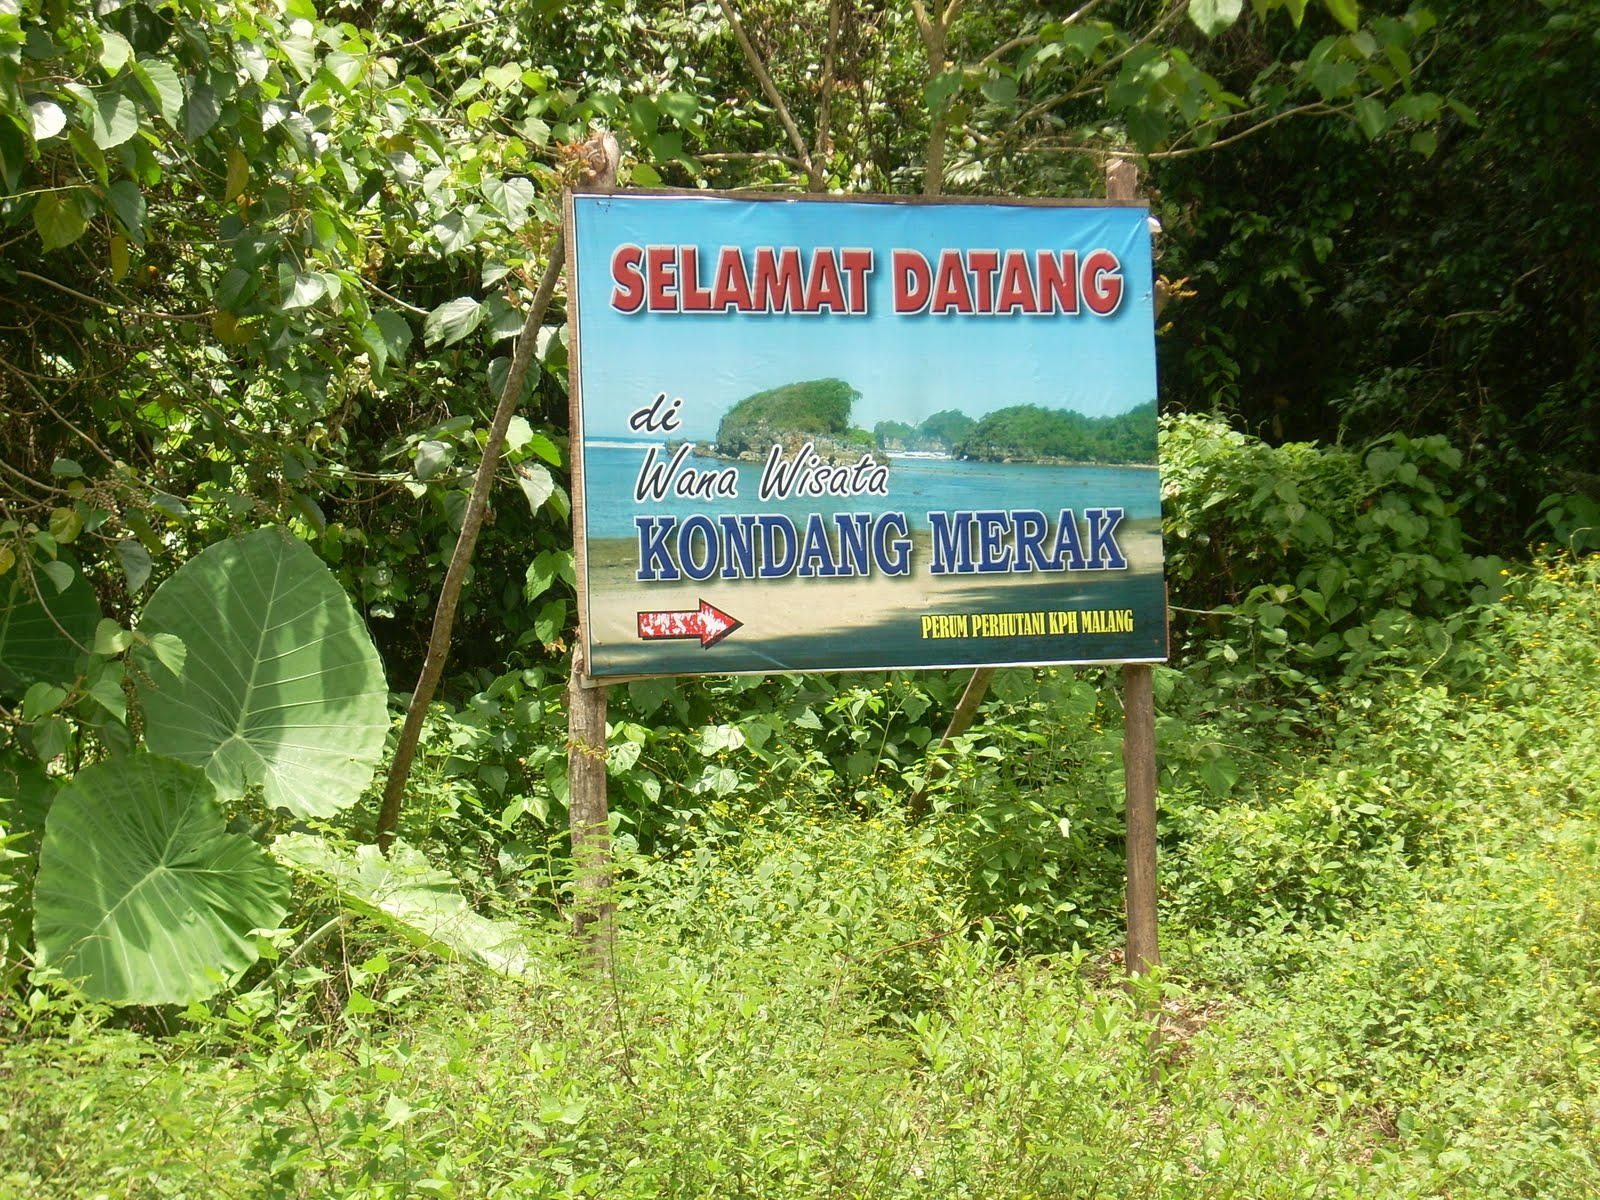 Traveling Cantiknya Pantai Kondang Merak Icon Wisata Malang Kota